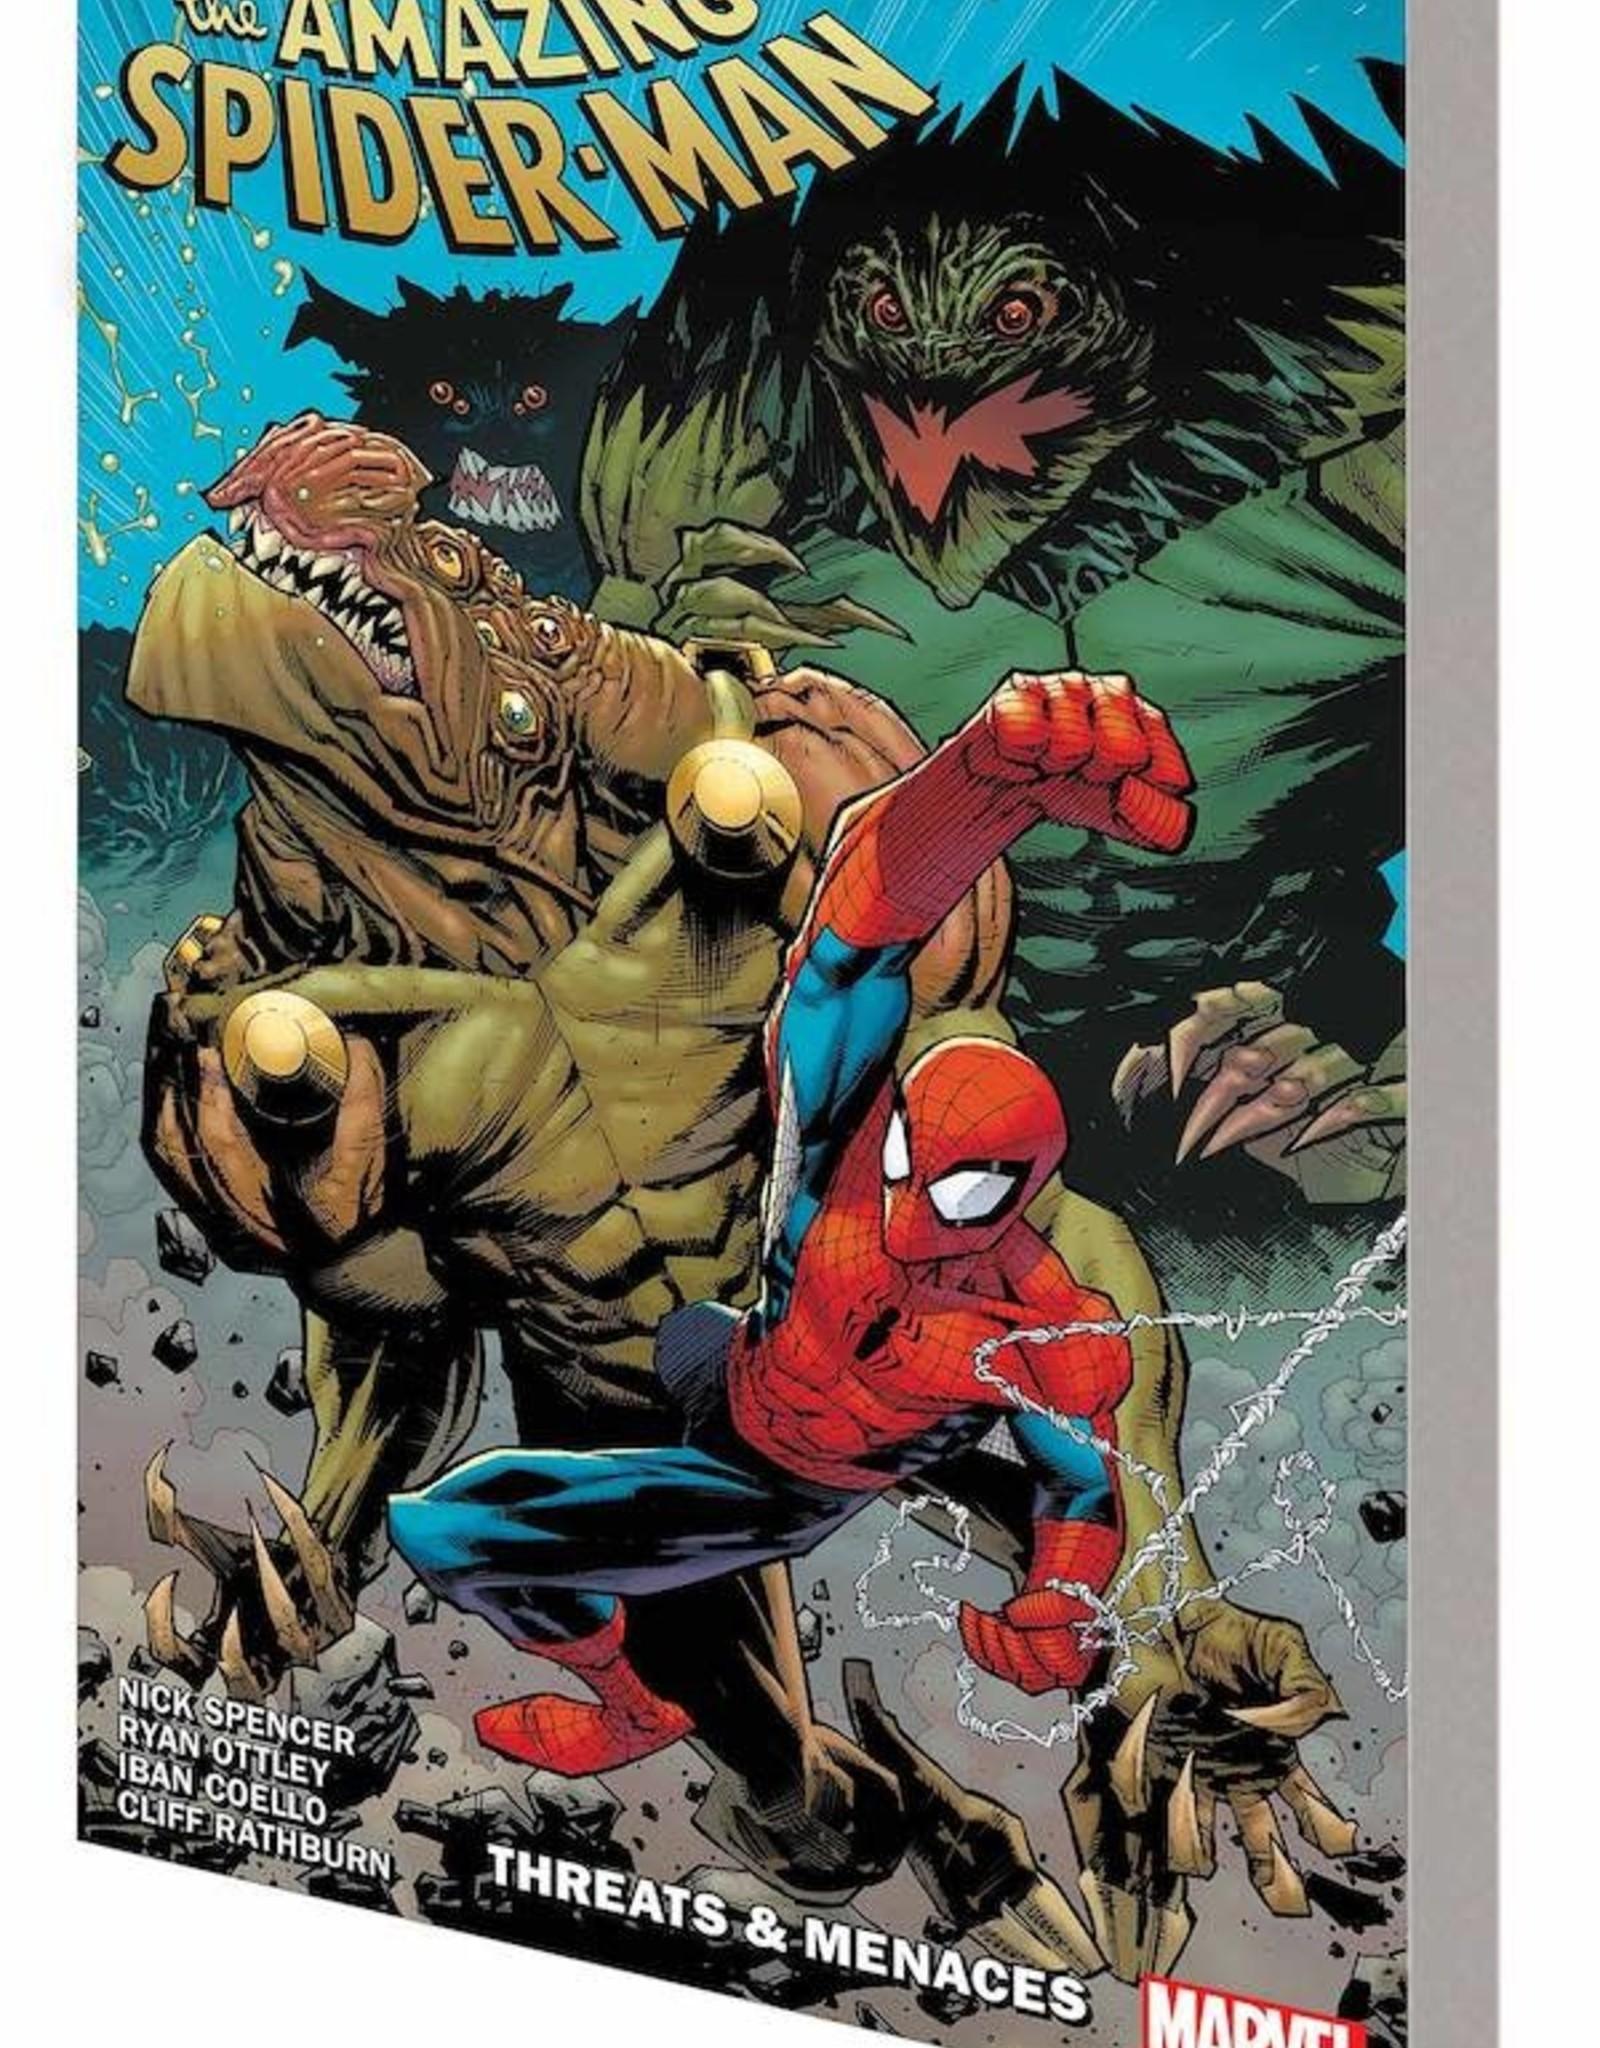 Marvel Comics Amazing Spider-Man By Nick Spencer Vol 08 Threats & Menaces TP